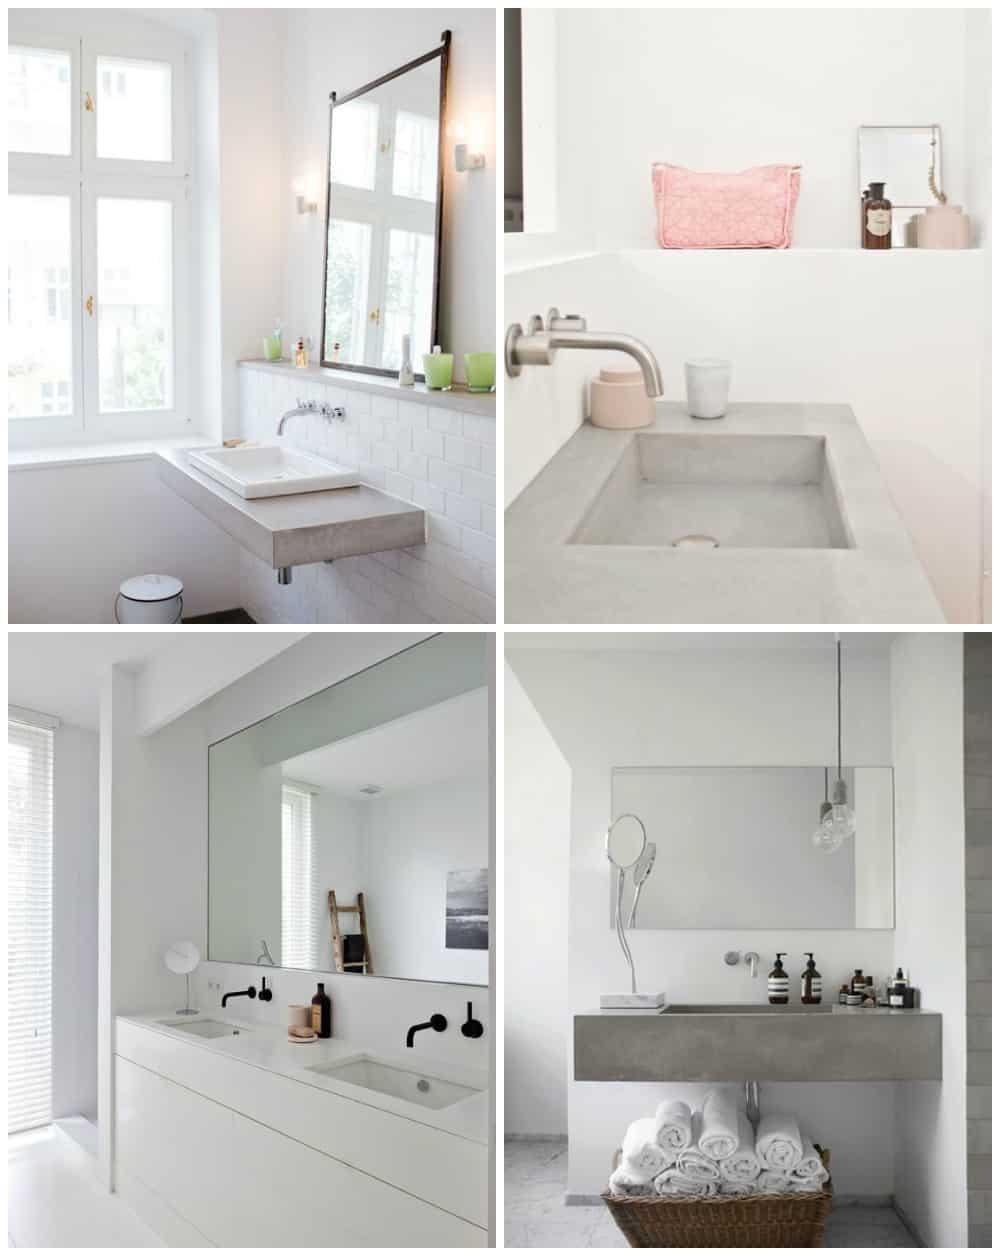 Awesome bagni in muratura mosaico great lavandino bagno in muratura bagno moderno with bagno in - Bagno in muratura moderno ...